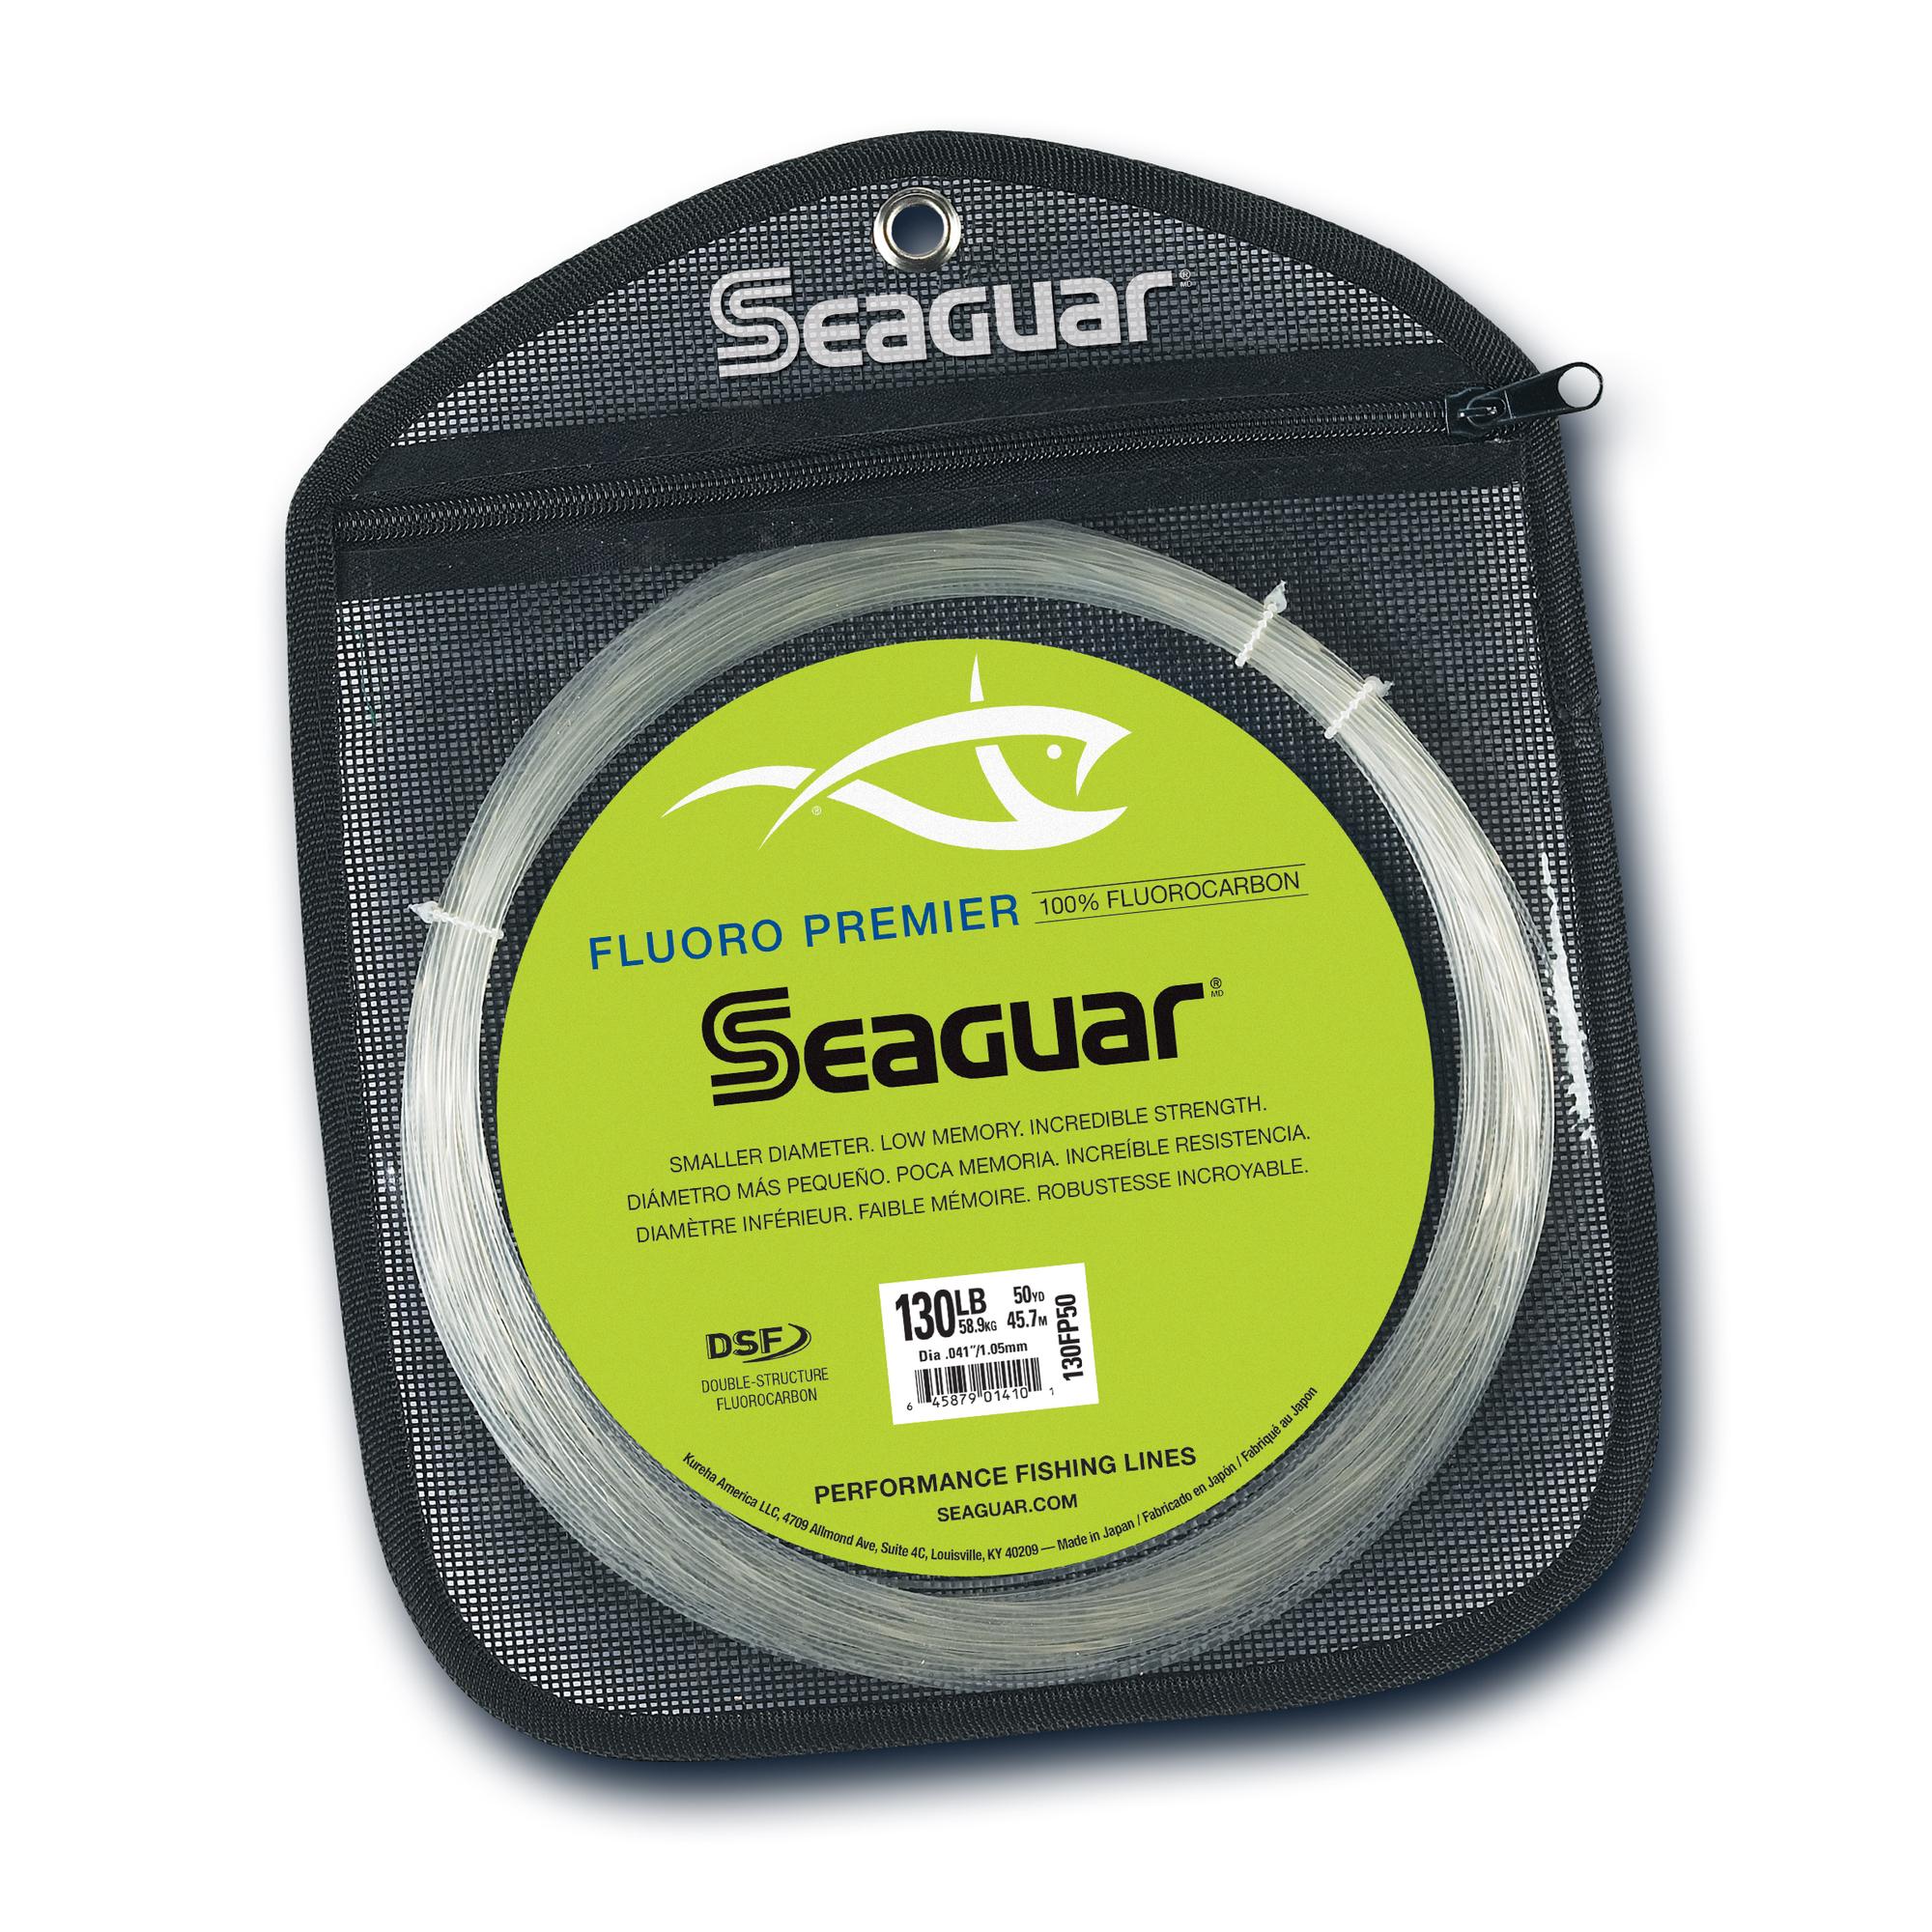 Seaguar Fluoro Premier Big Game Fishing Line 50 130LB